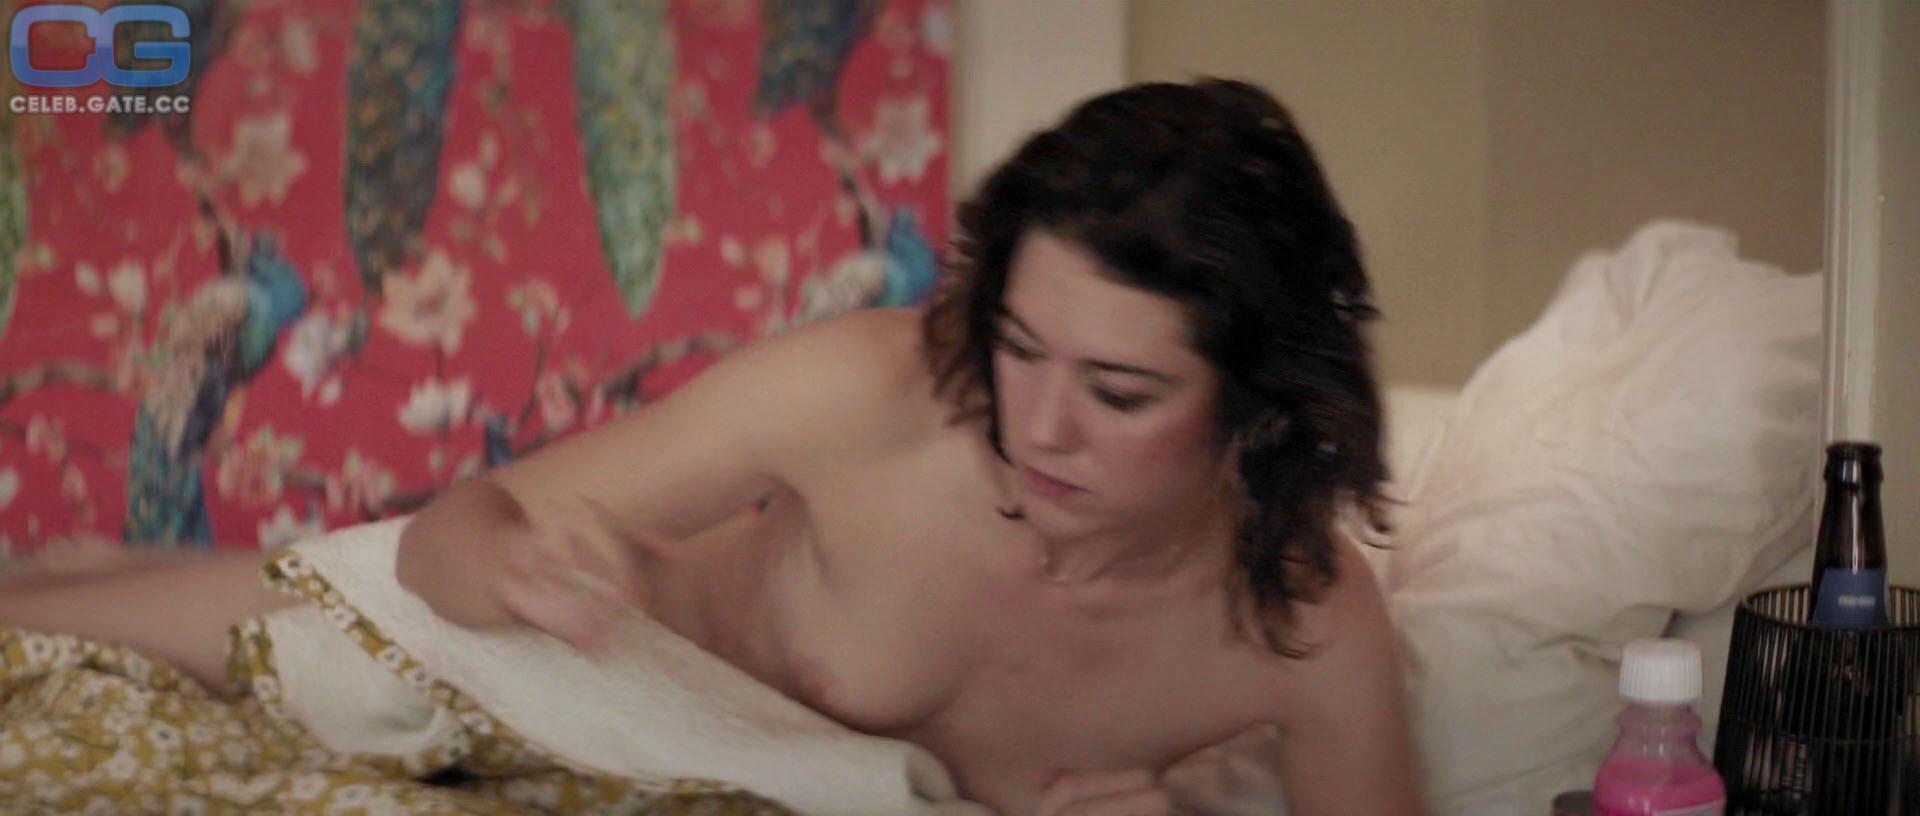 Mary Elizabeth Winstead  nackt